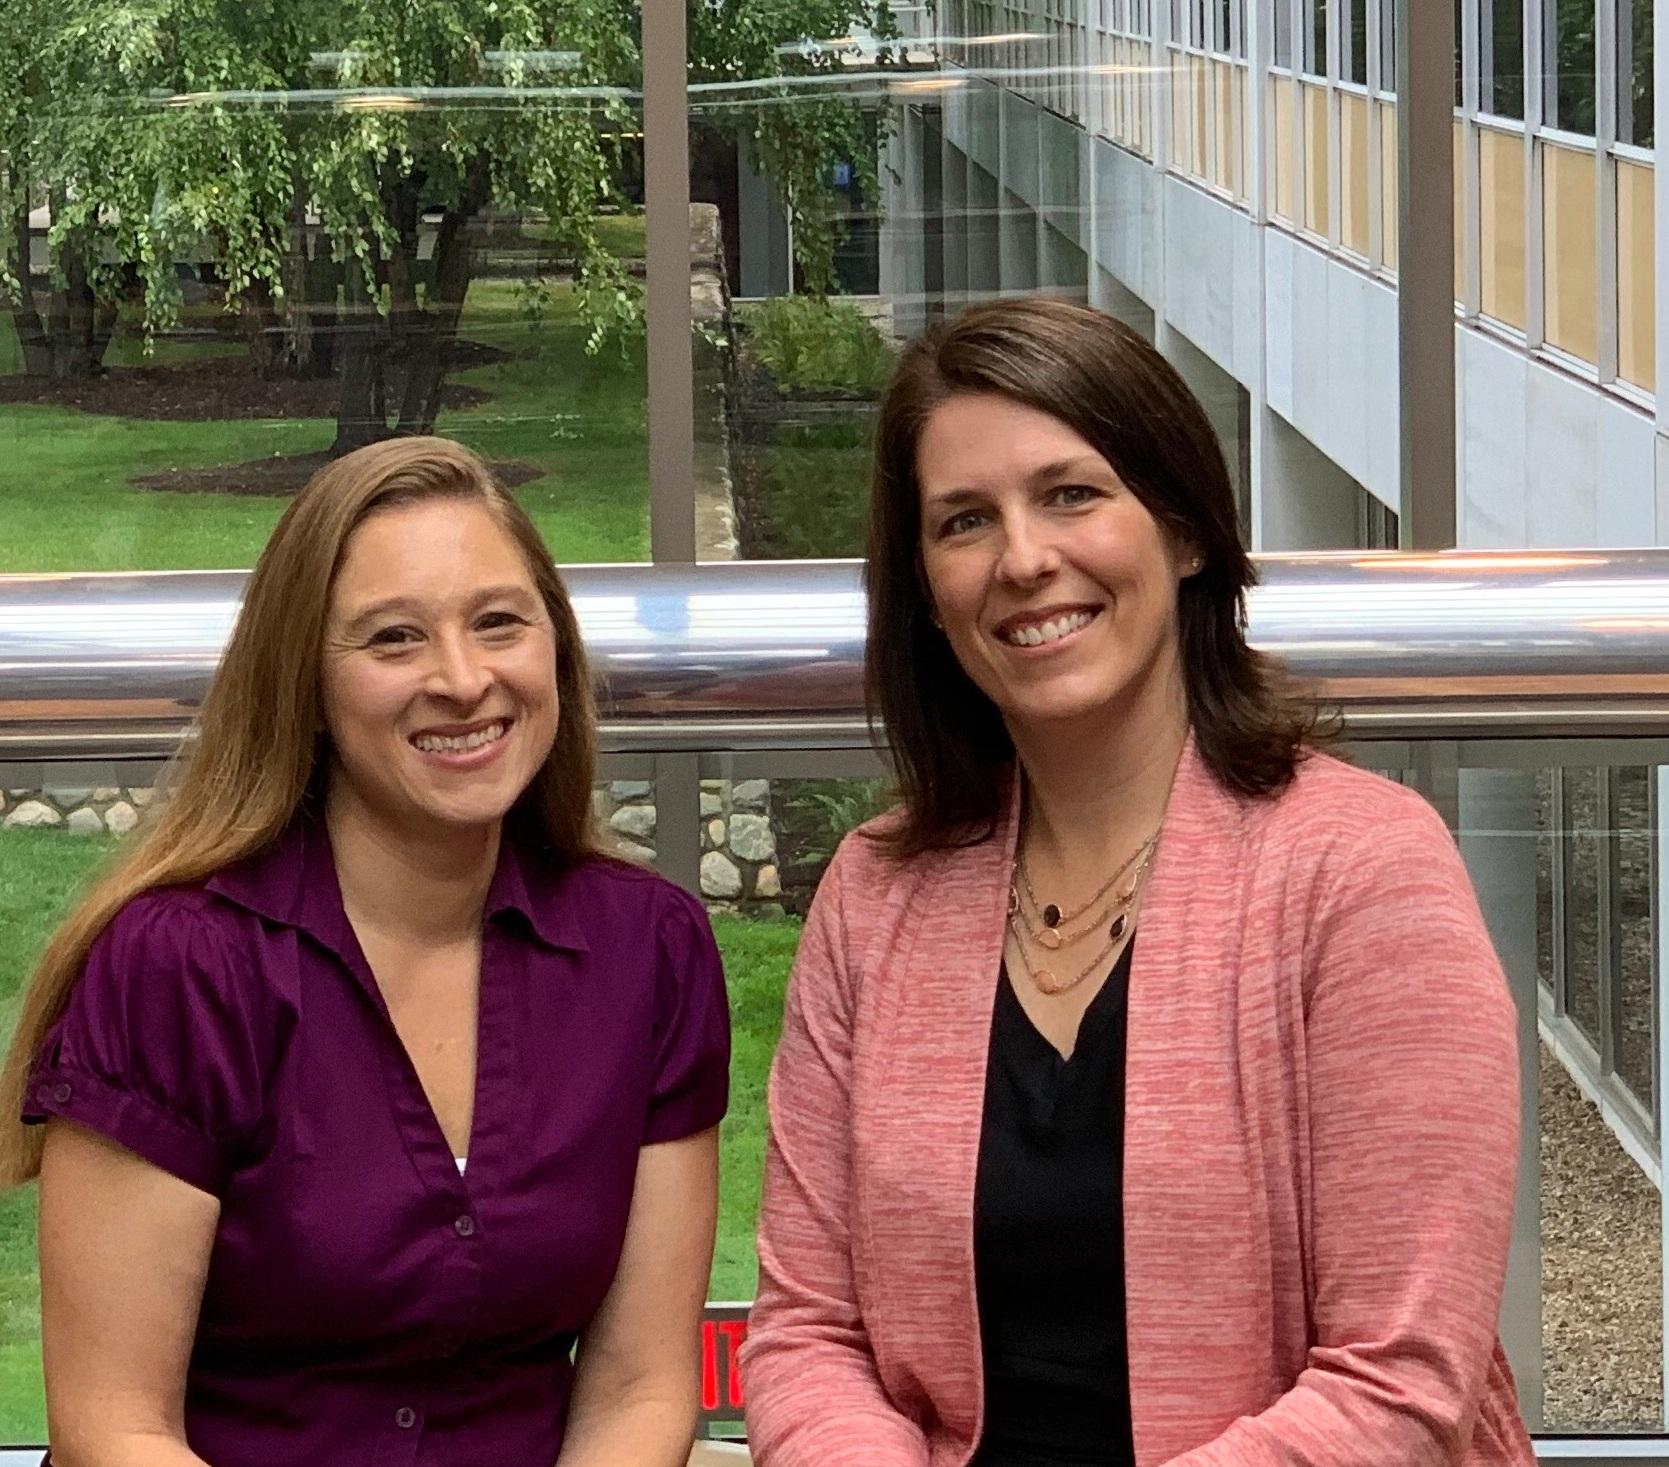 OBI Clinical Site Engagement Coordinators Jessica L. Souva MSN, RNC-MNN & Jill E. Brown, BS, RN